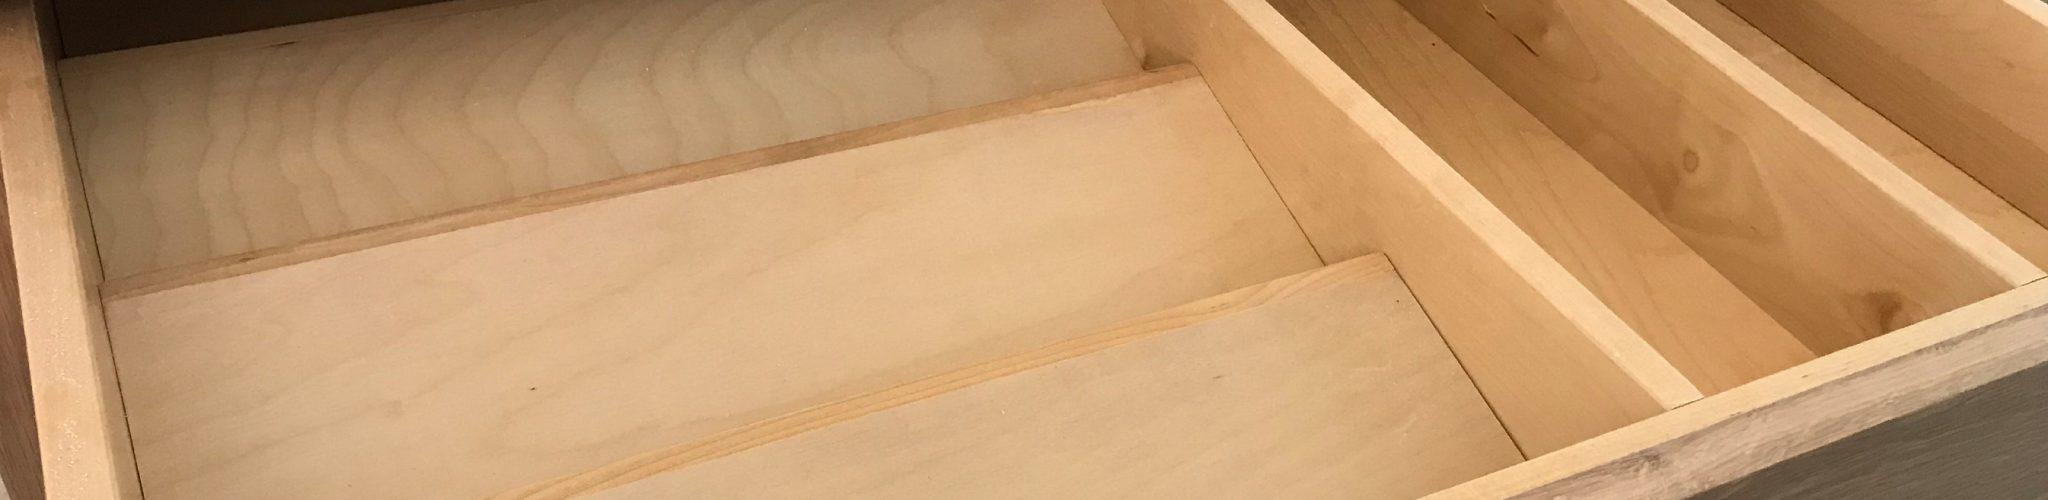 spice_rack_drawer_2